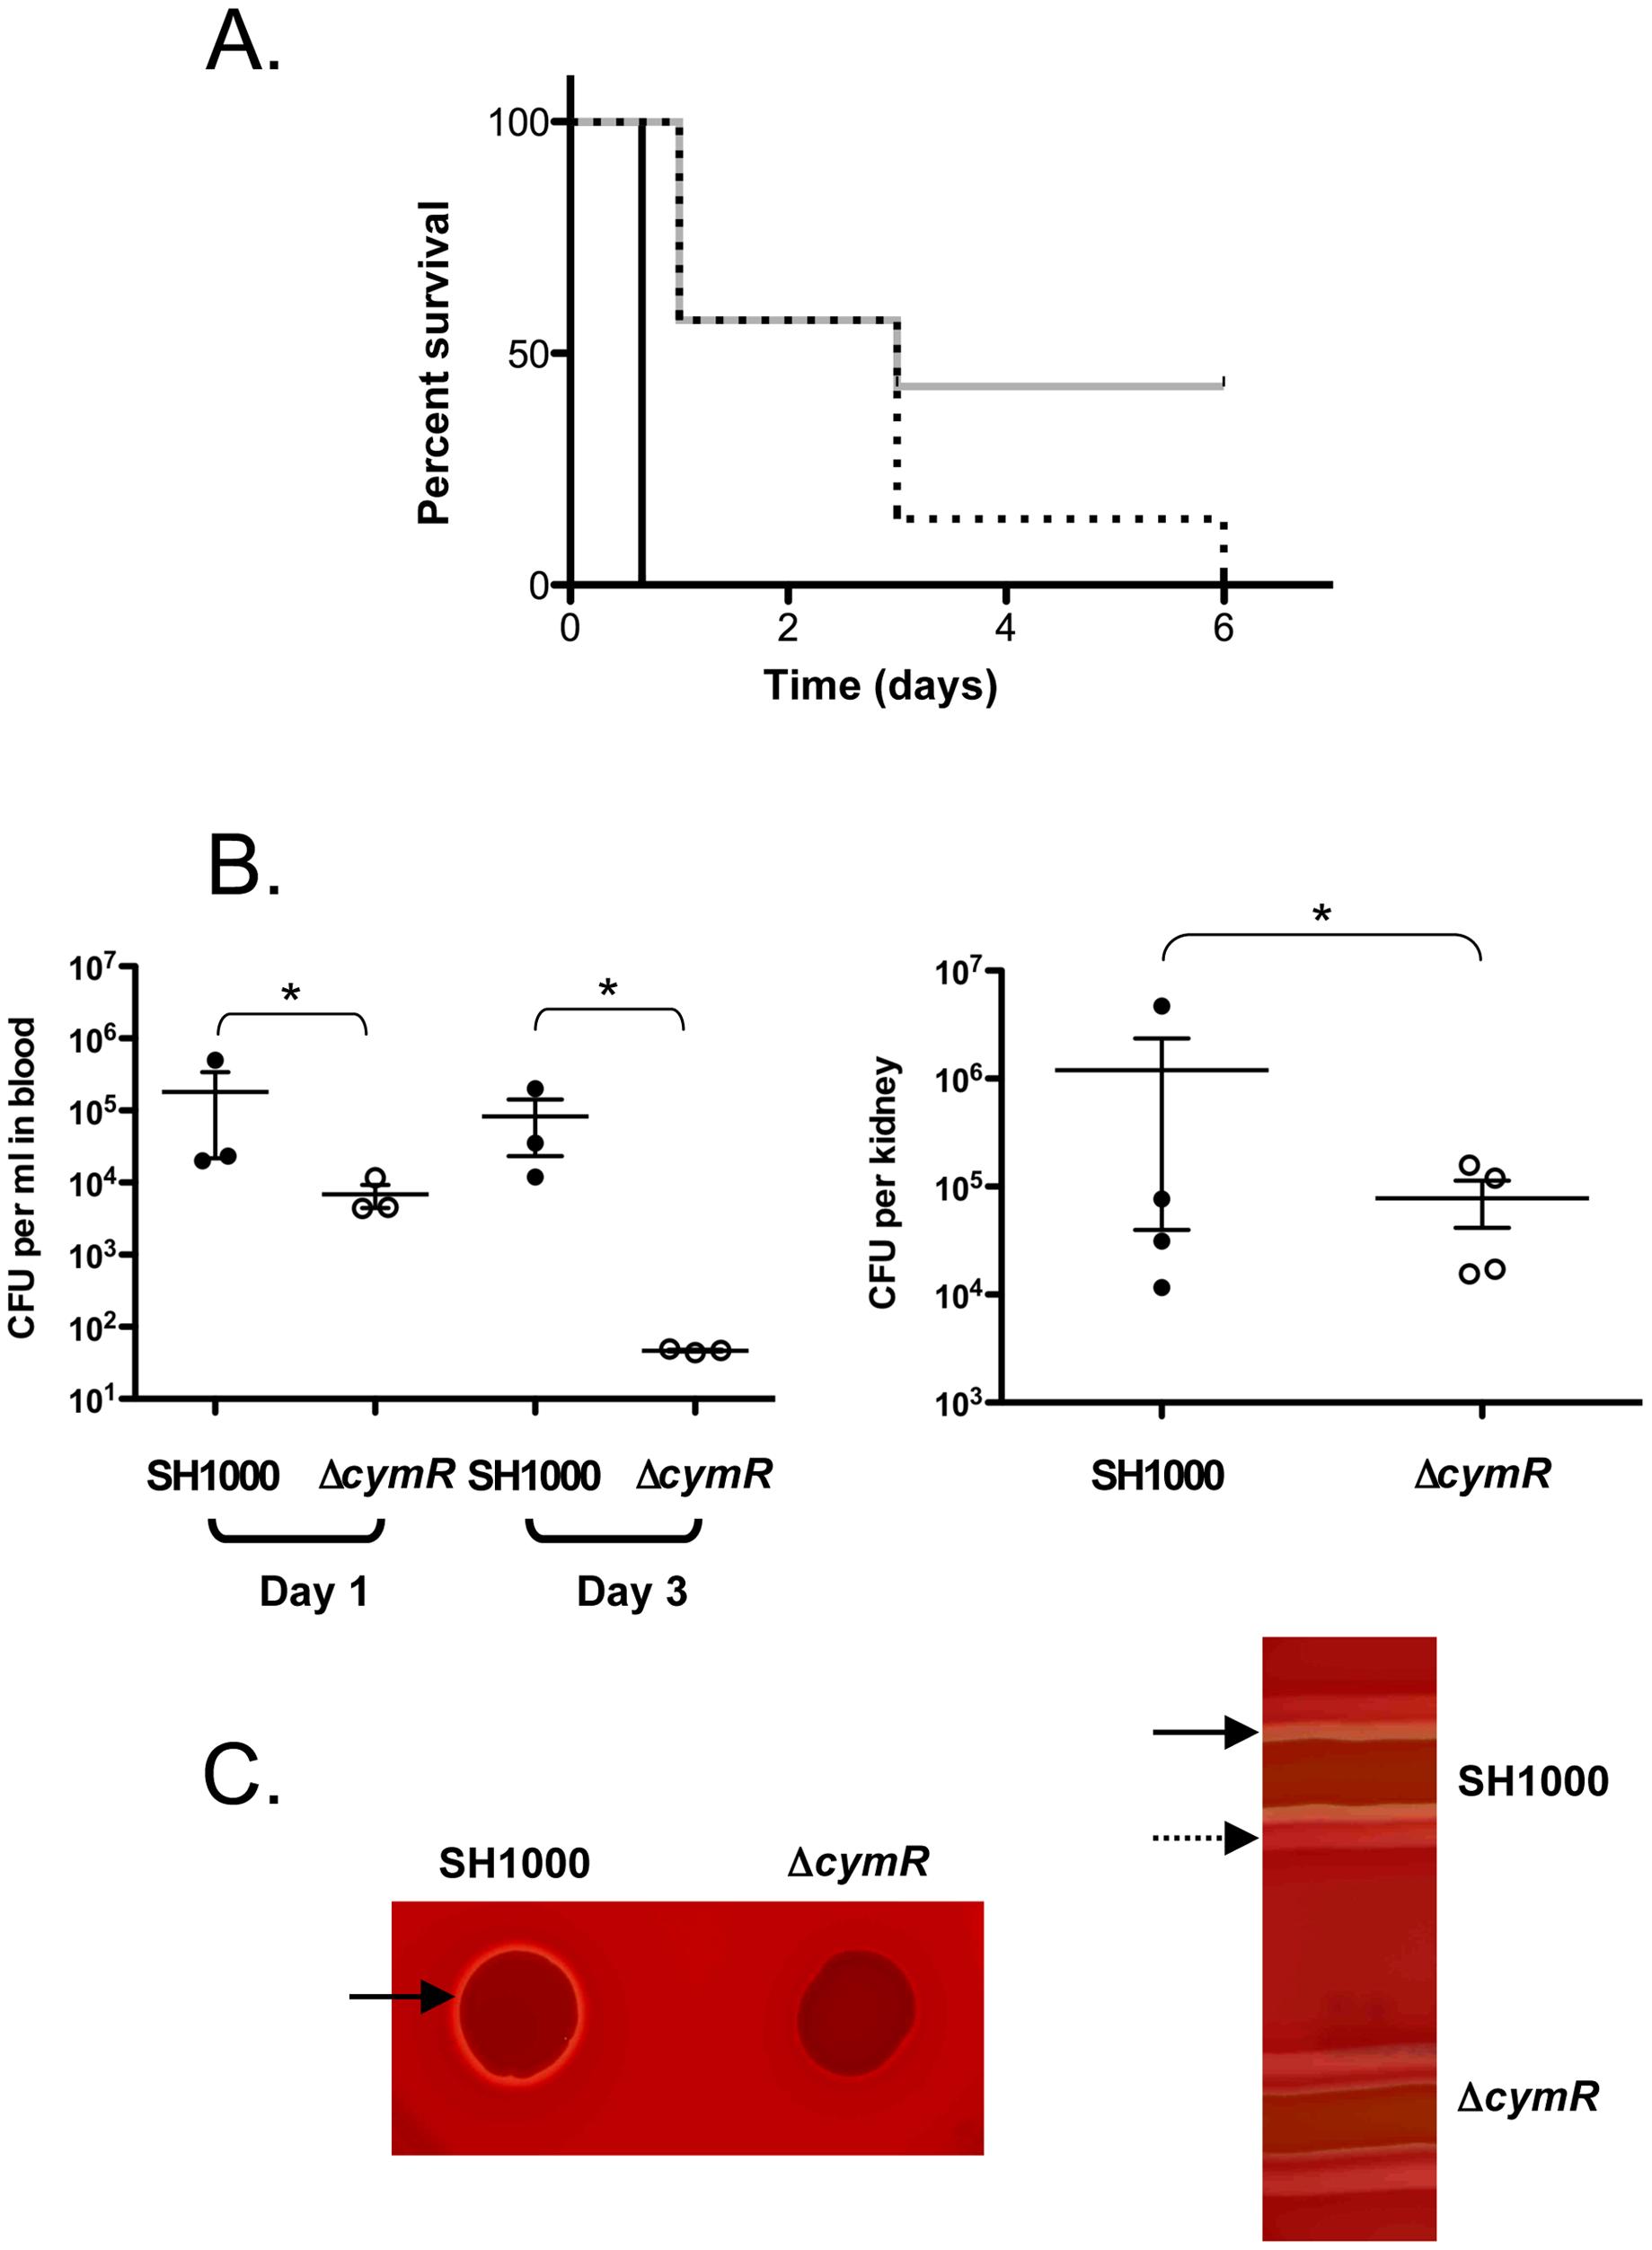 Role of CymR during <i>S. aureus</i> infection.